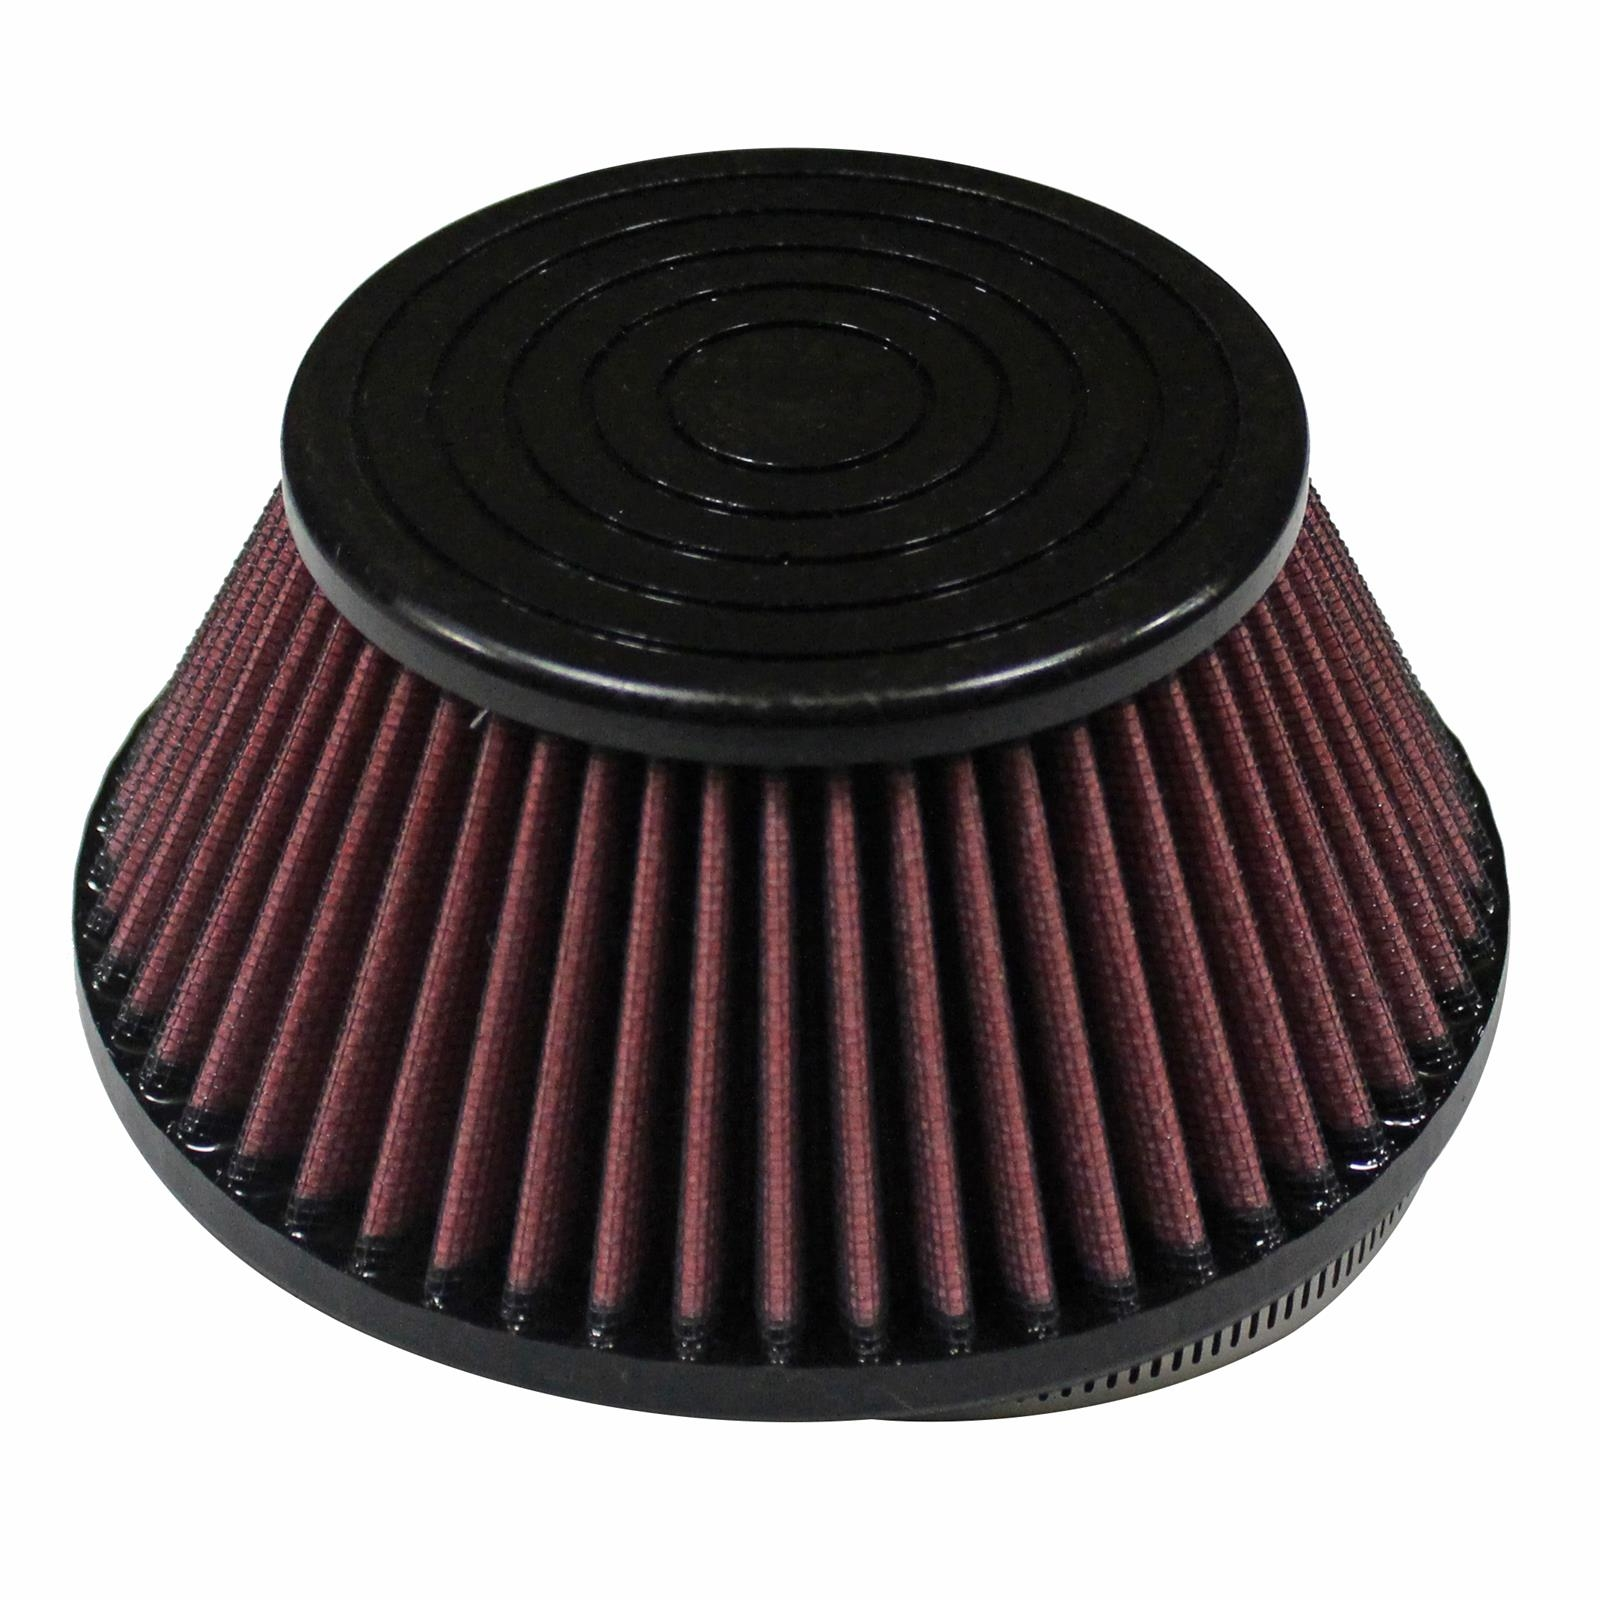 Supercharger Air Cleaner : Vortech supercharger air filter quot flange offset